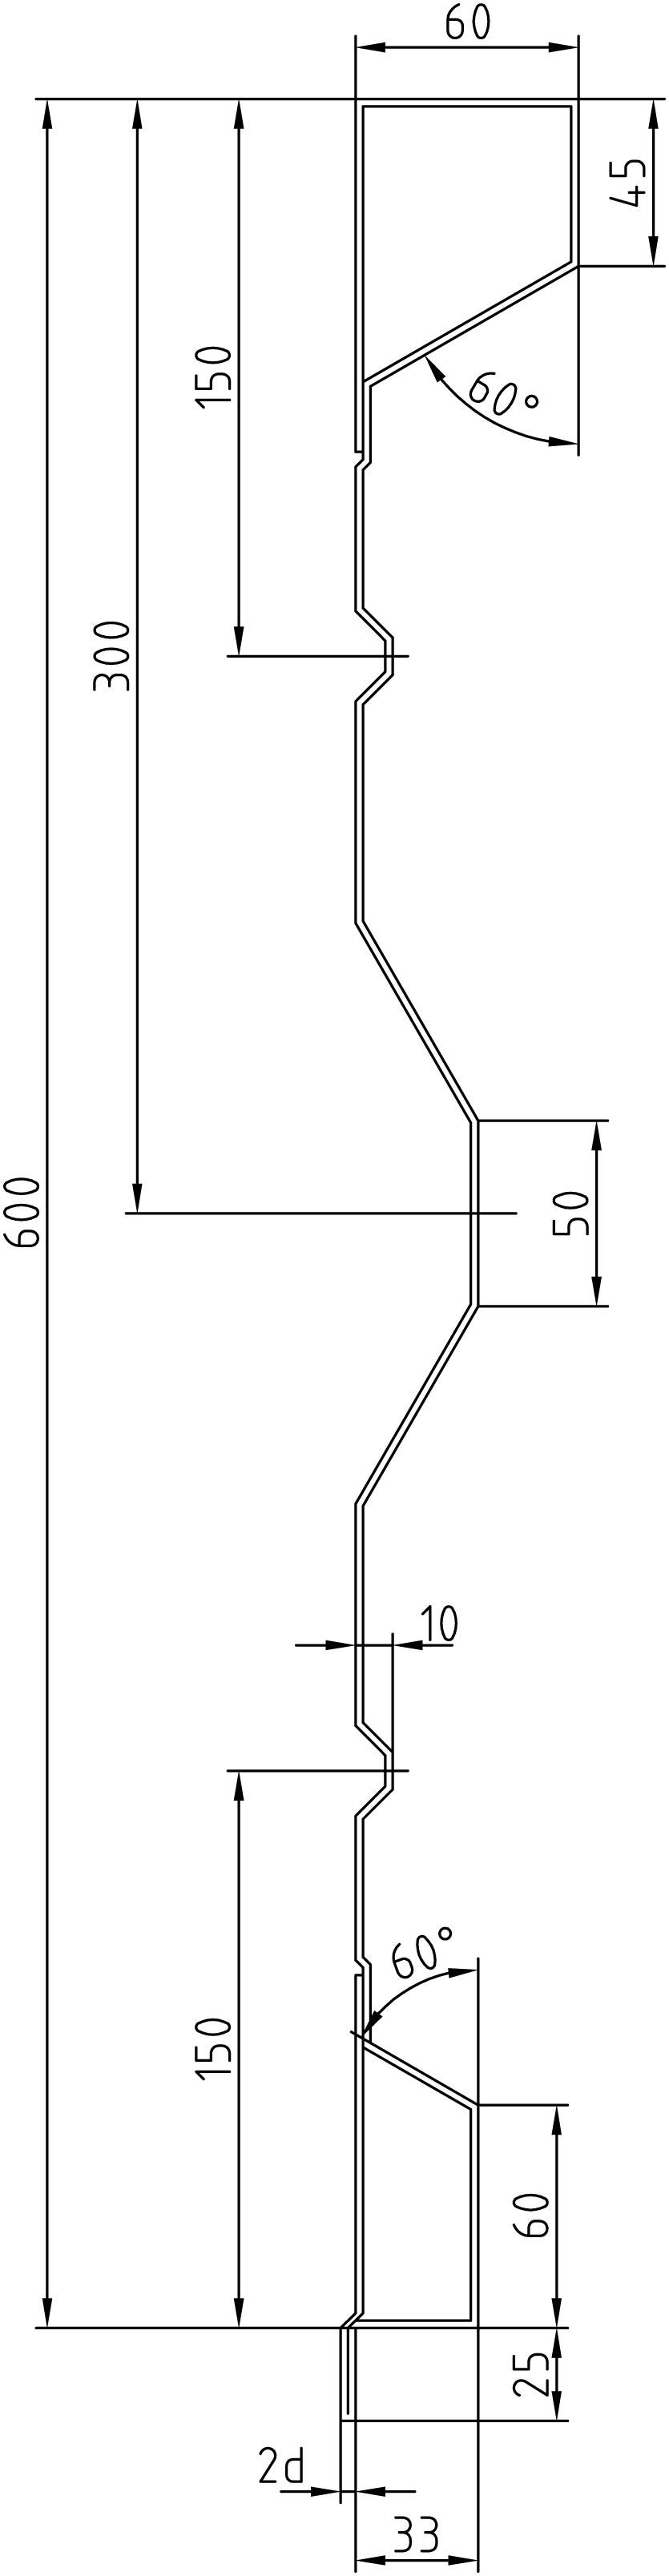 Brantner Kipper und Anhänger - 600x2,5x7720 AW samt EL o. BW- Verb. o. PW- Bolzen